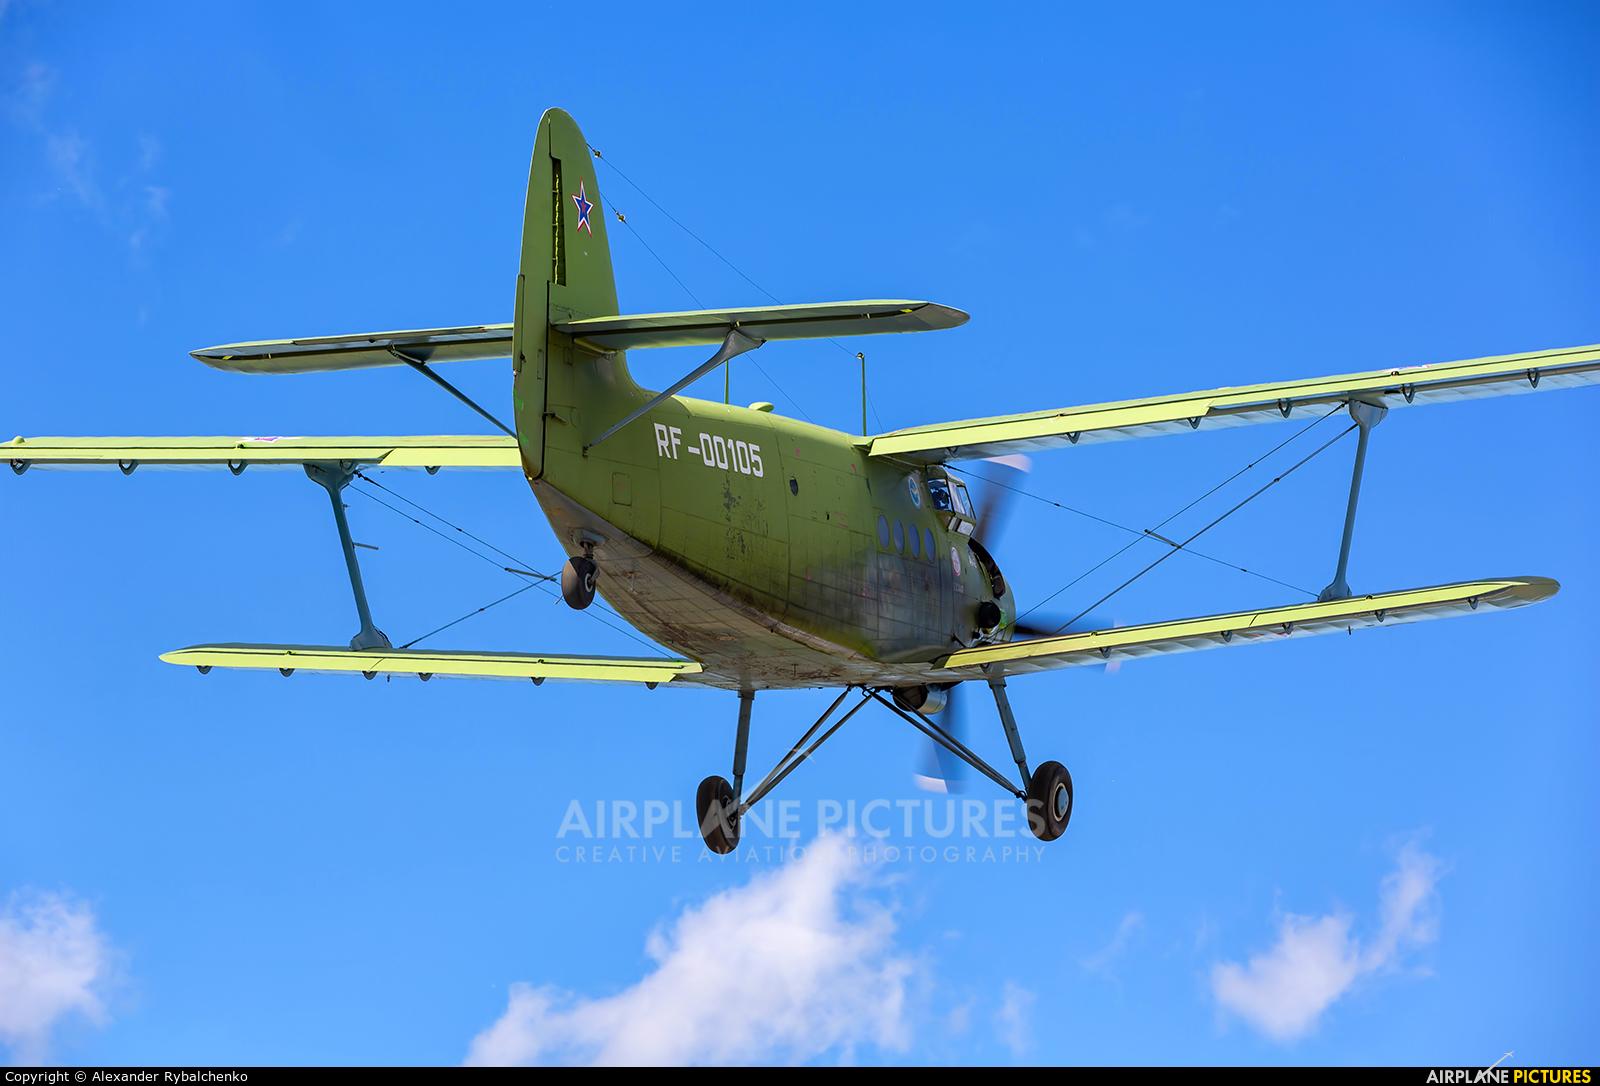 DOSAAF / ROSTO RF-00105 aircraft at Borskoje